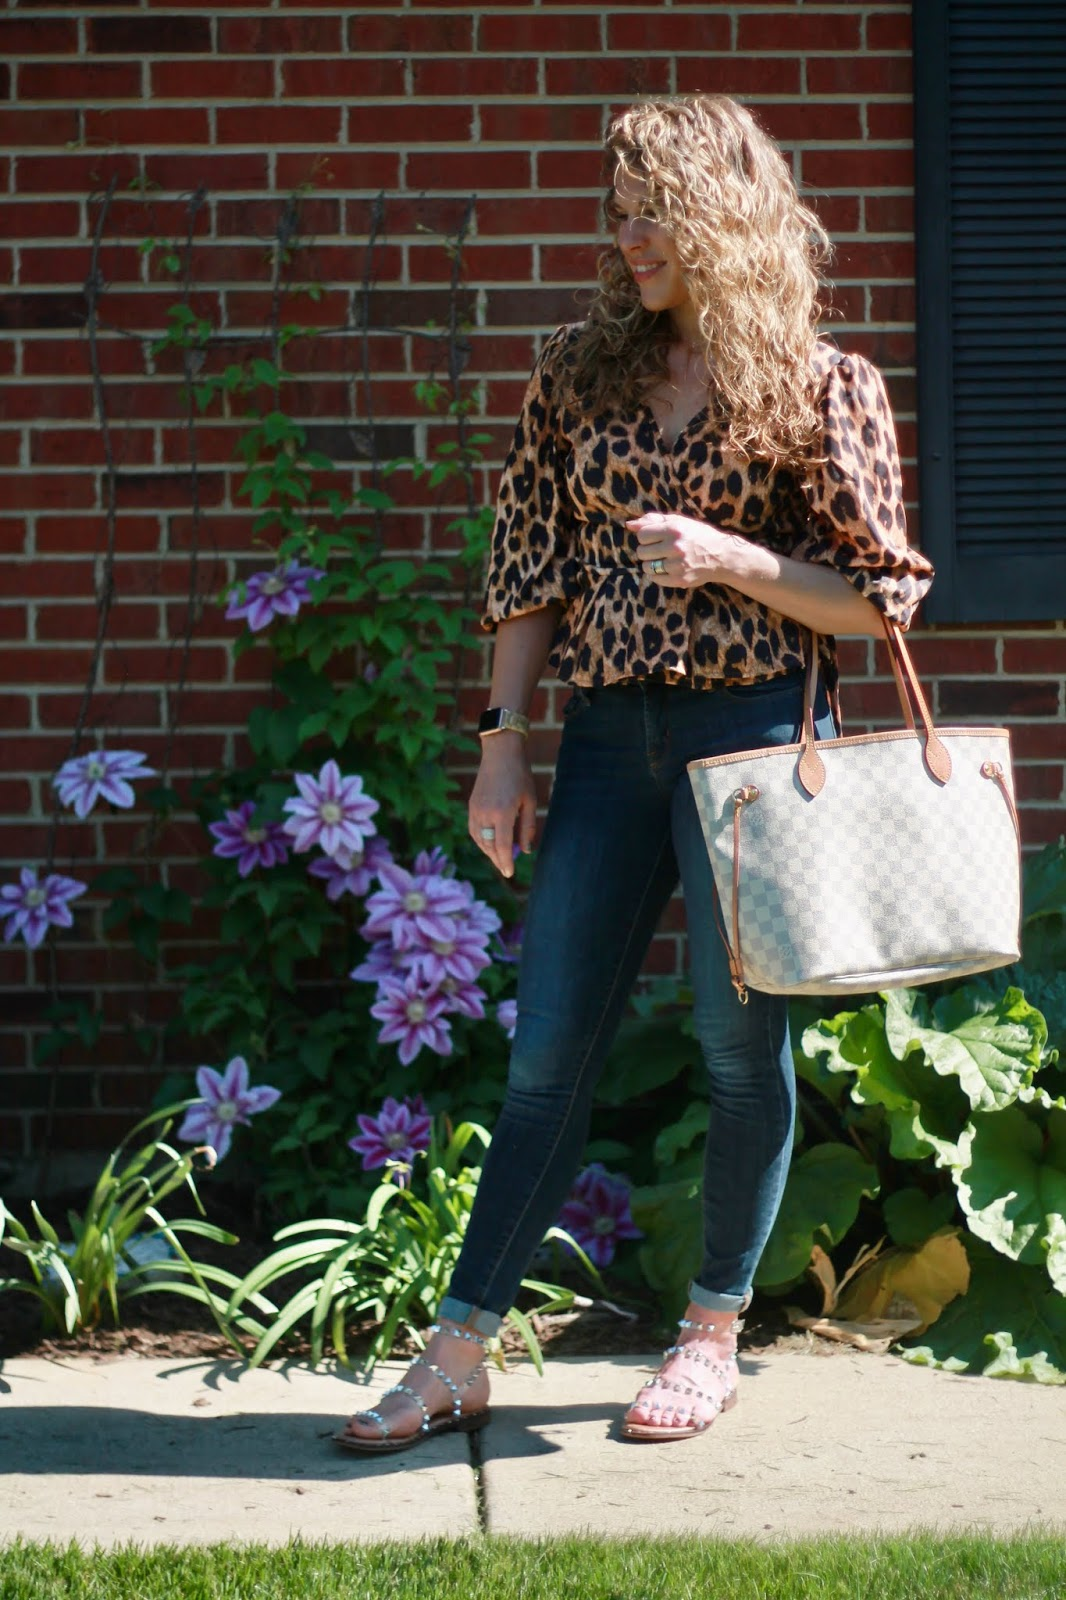 leopard peplum top, rockstar skinny jeans, steve madden clear travel sandals, LV azure neverfull, leopard spring outfit